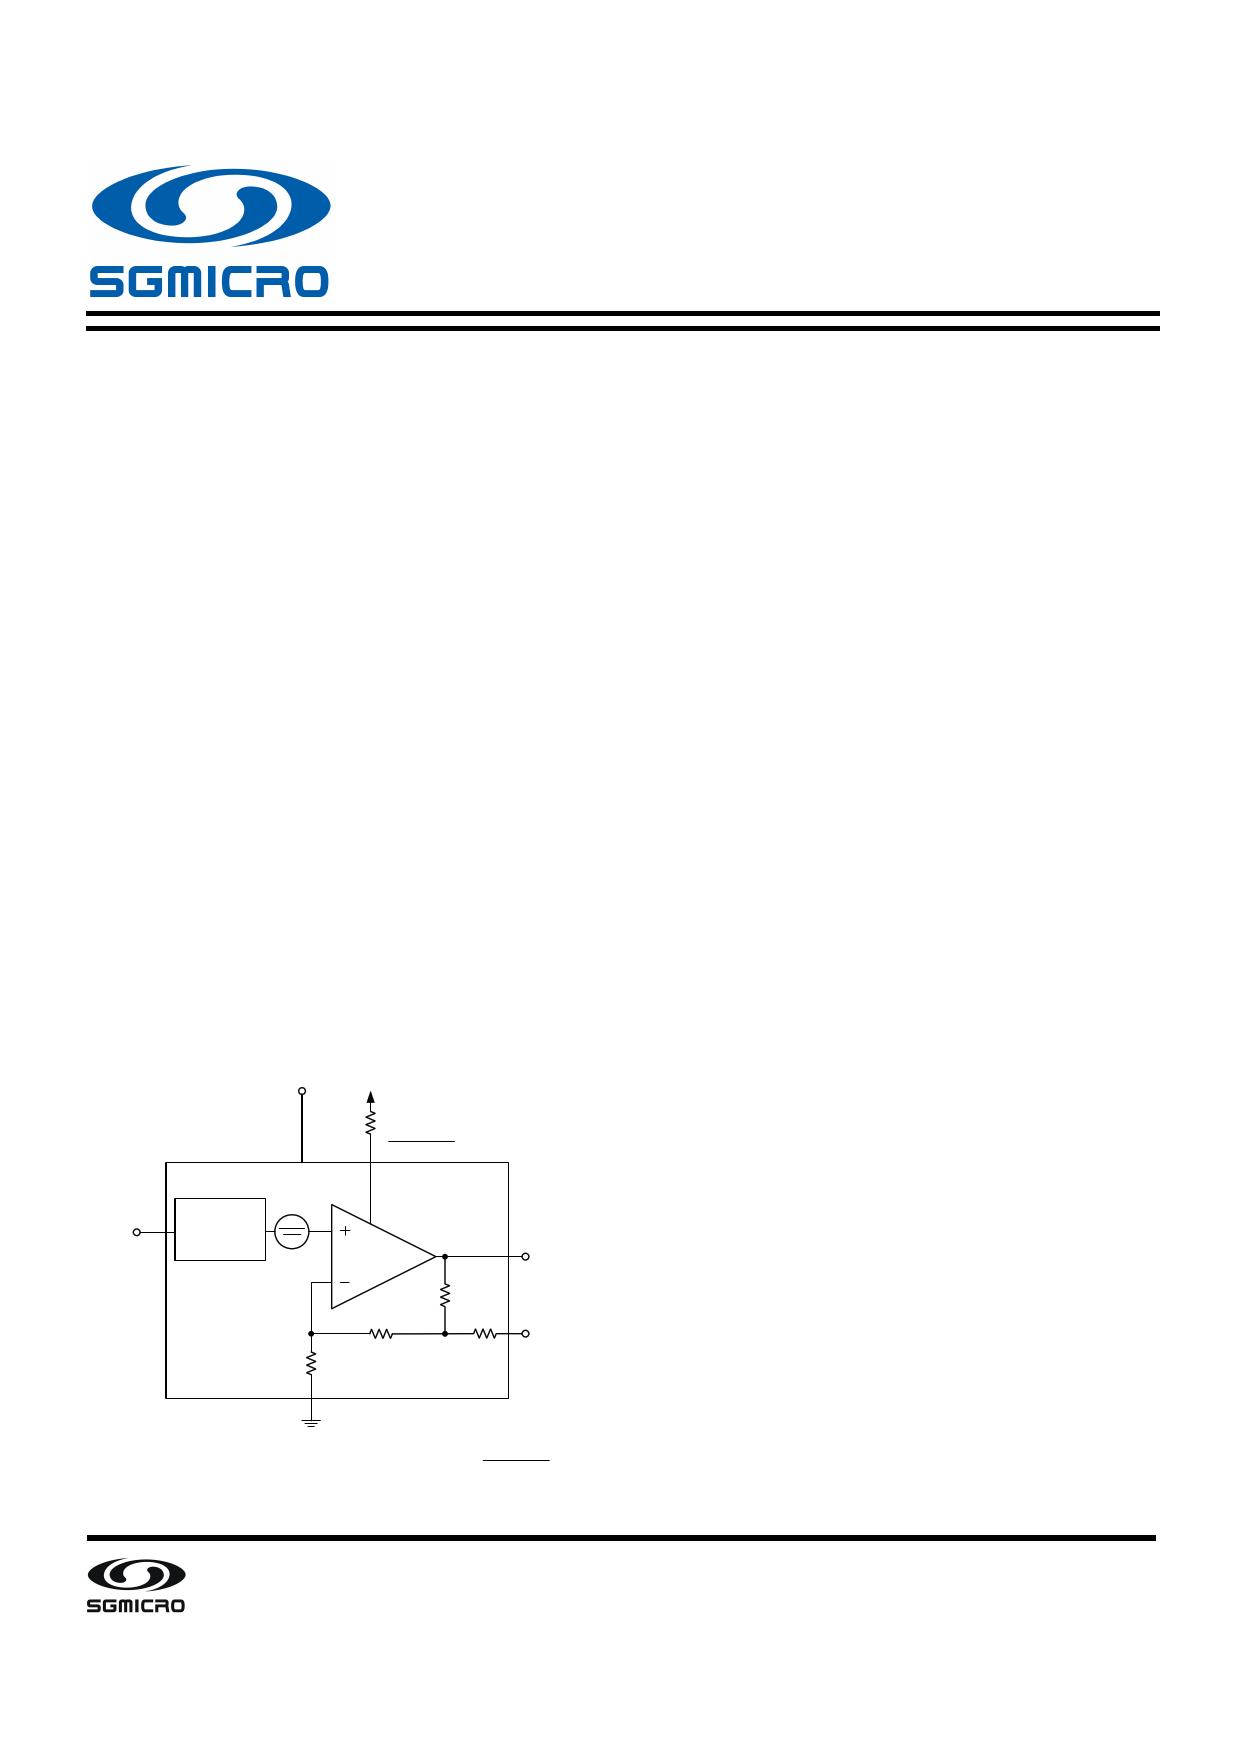 SGM9121 datasheet, circuit